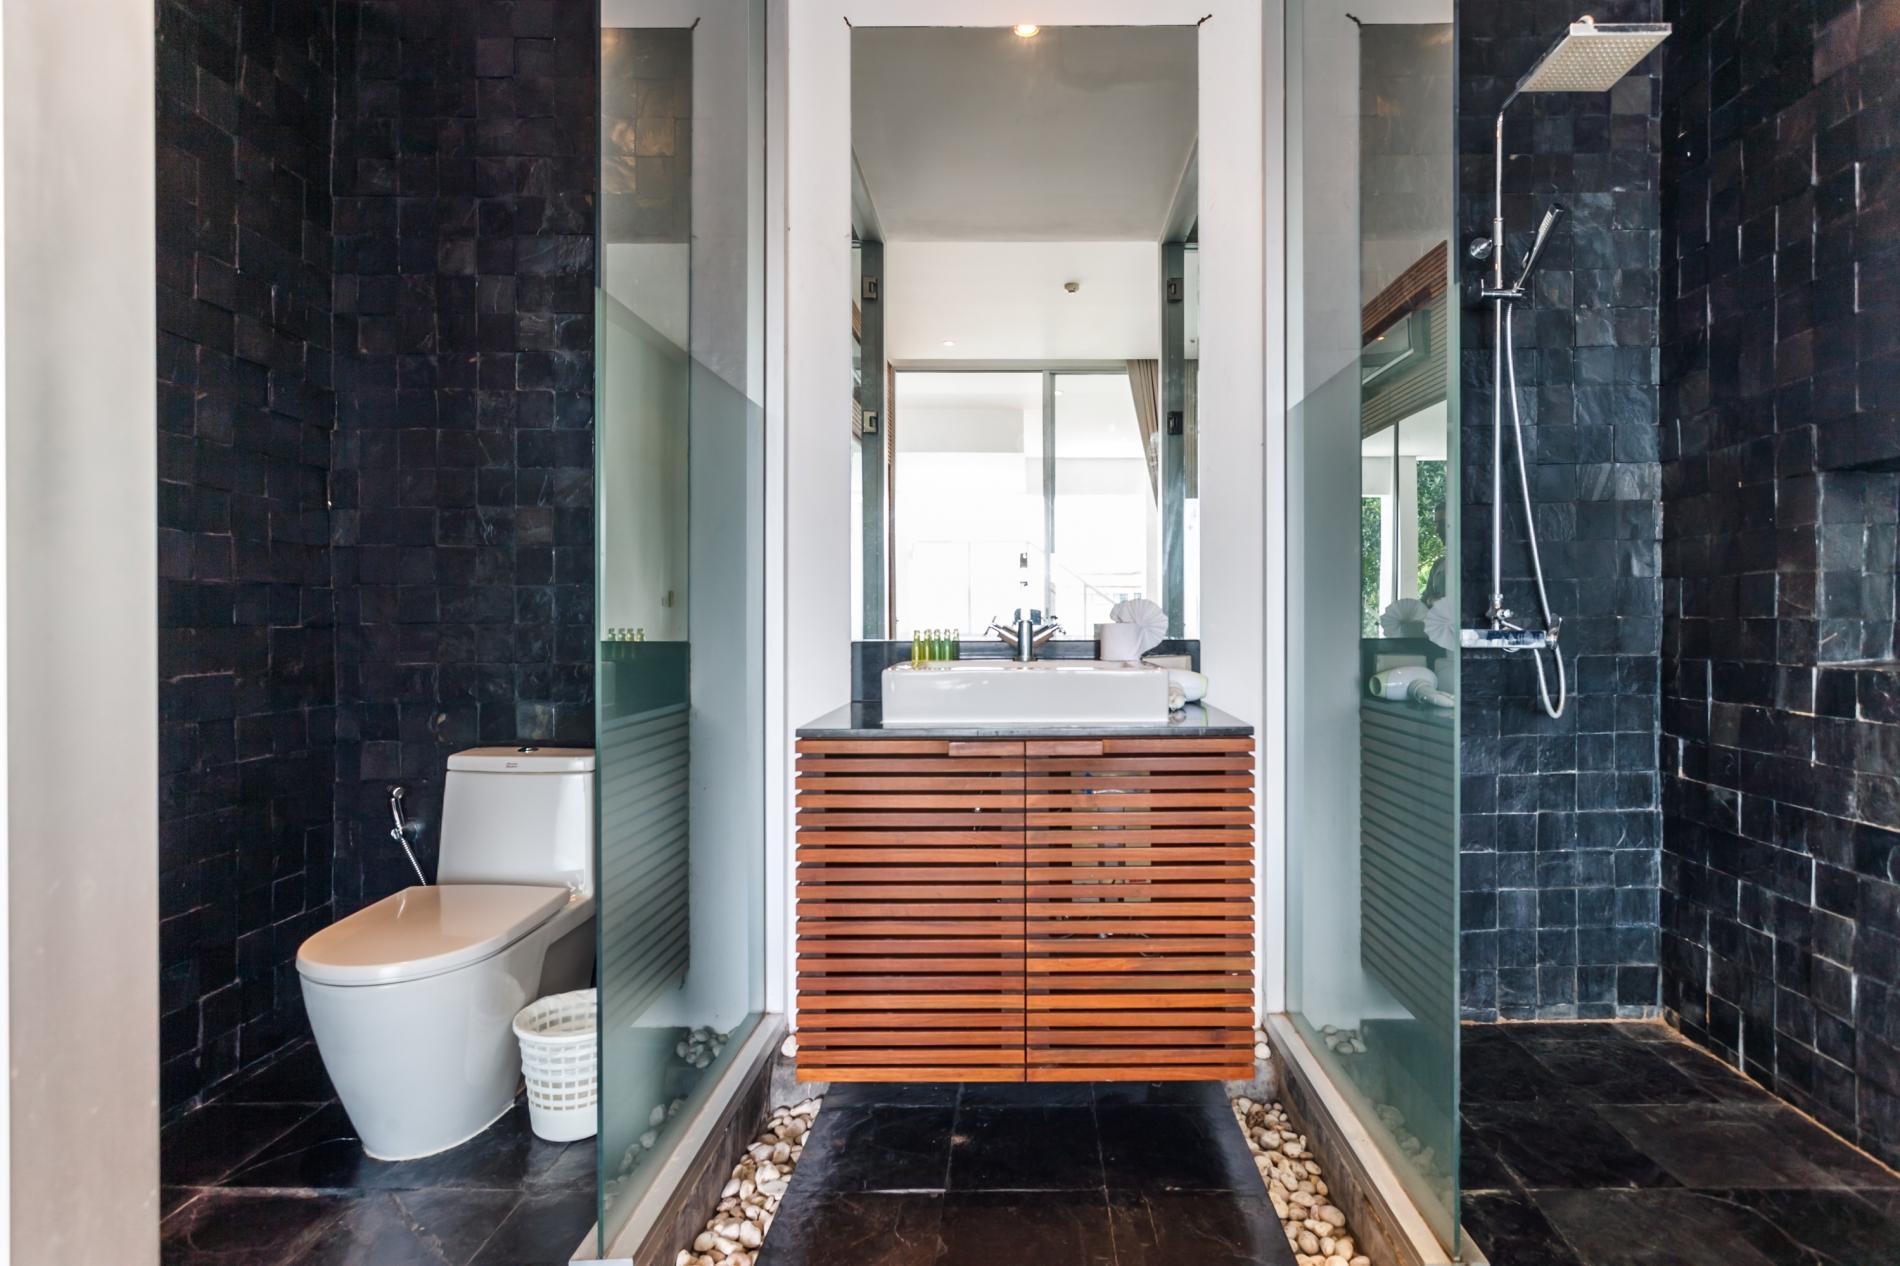 Apartment The Quarter 301 - Luxury Surin 3 bedroom apartment private pool photo 20255006